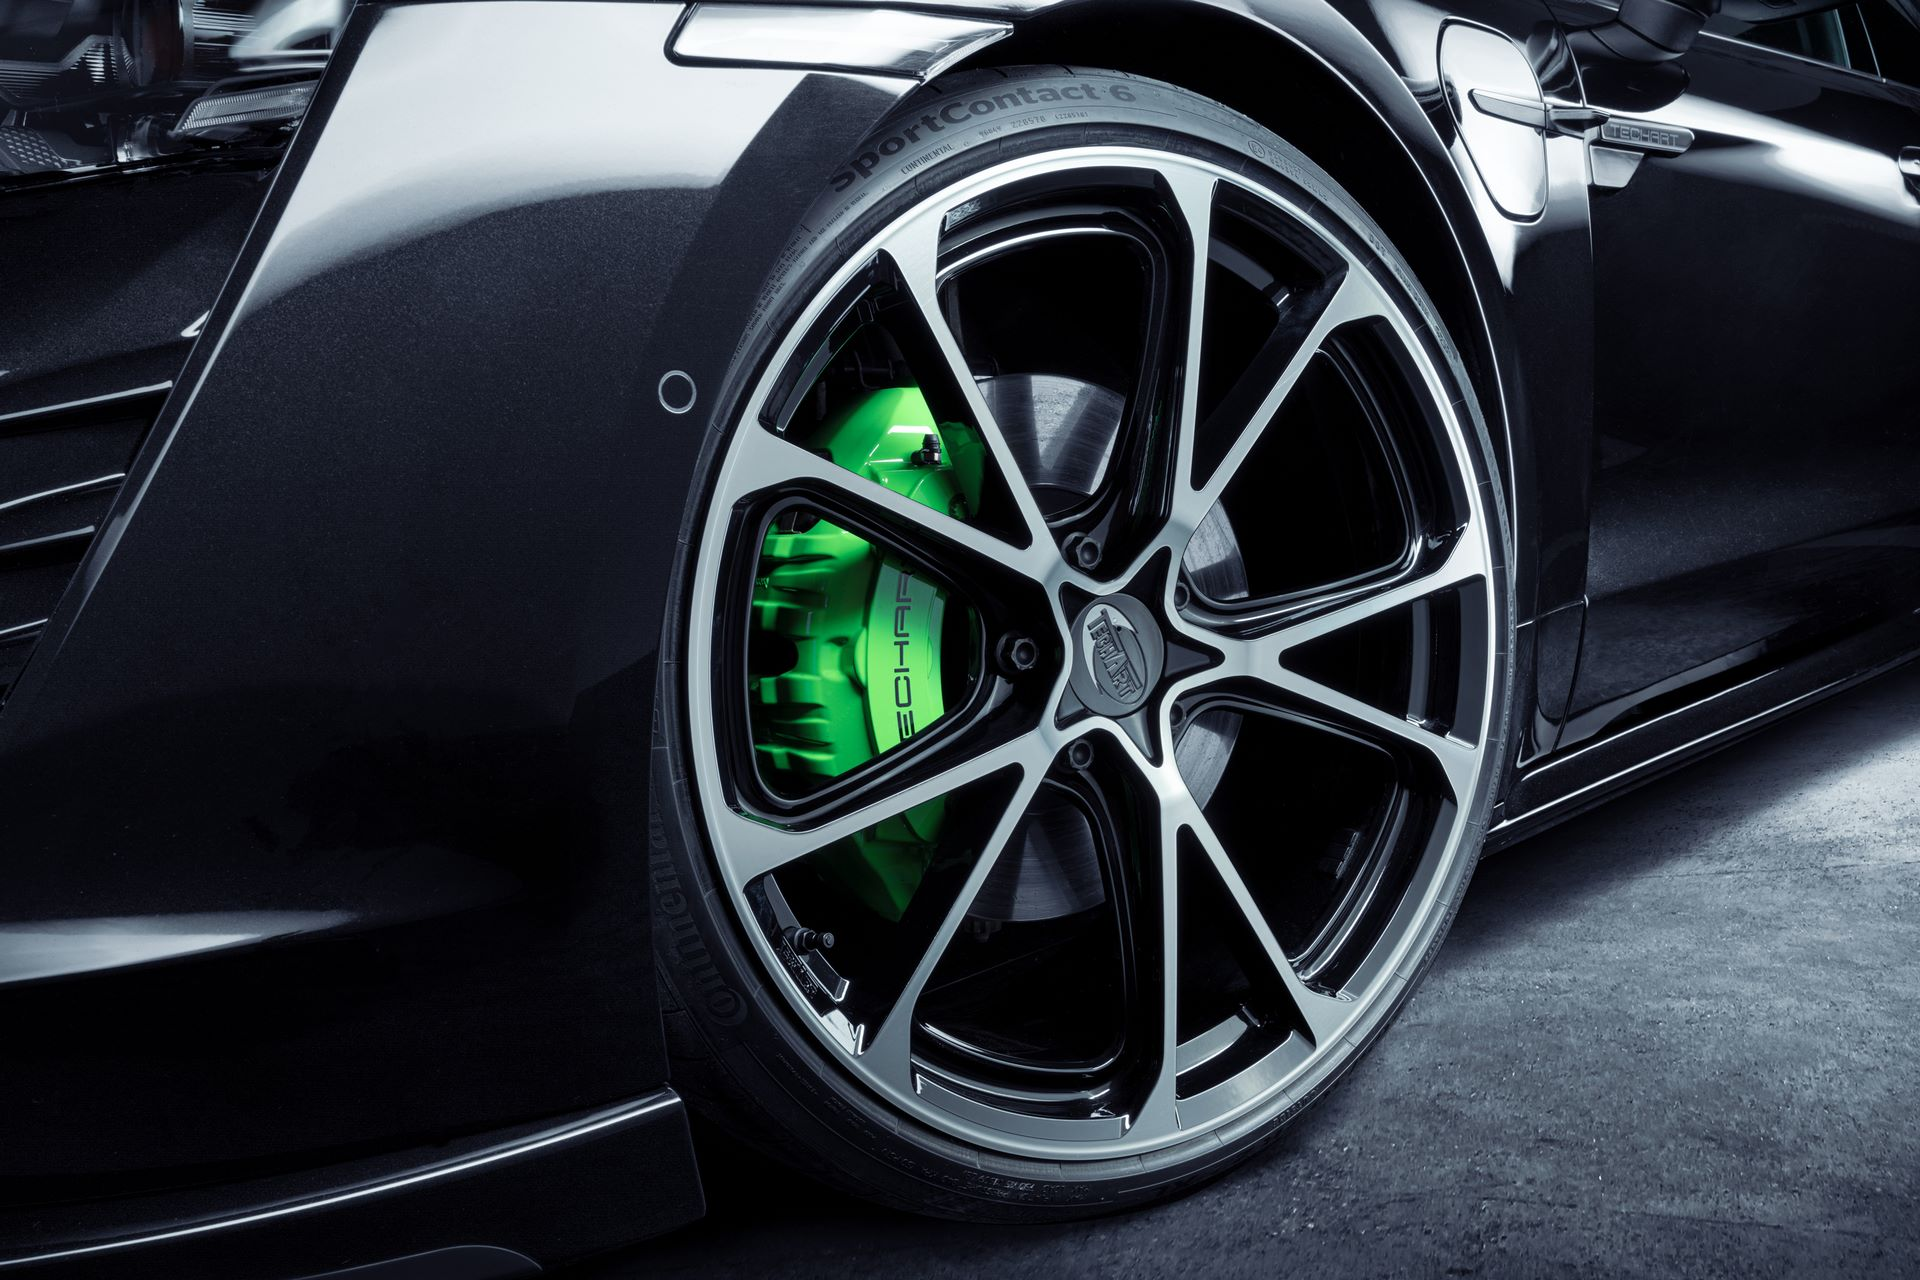 Porsche-Taycan-bodykit-by-TechArt-22